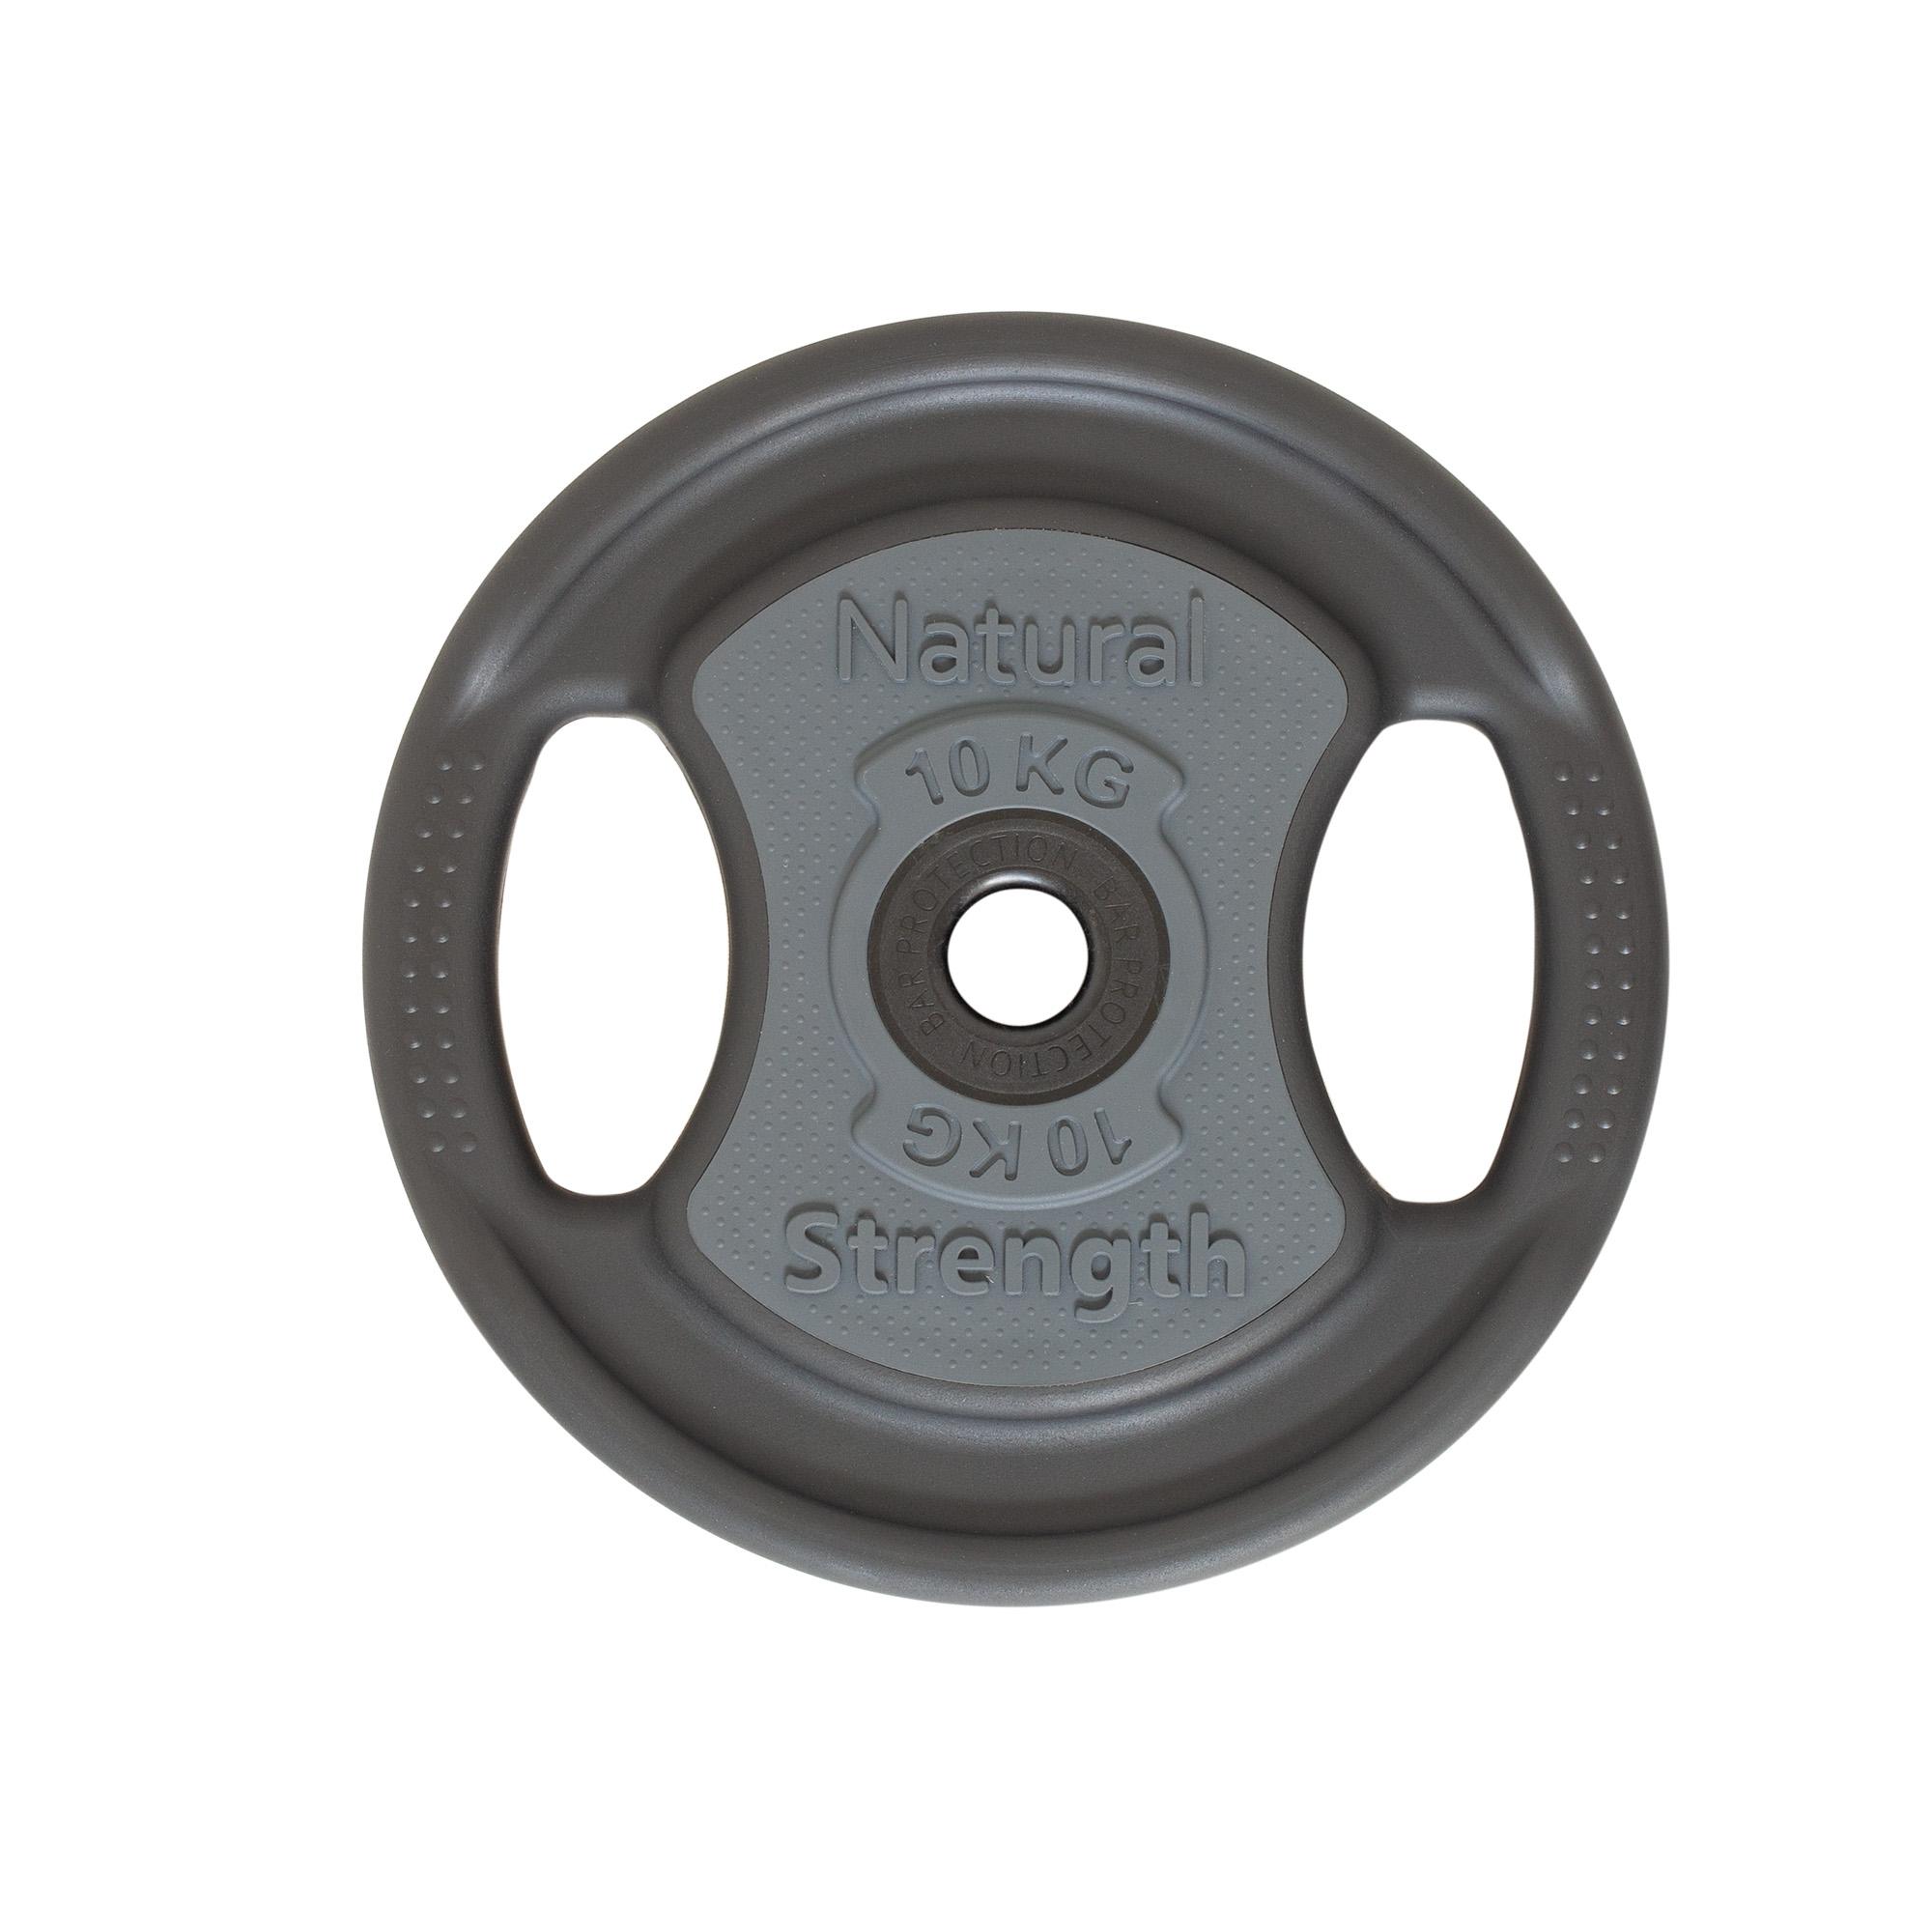 Hektor-Sport Natural strength 10kg NS10 10424124266 - Allegro.pl